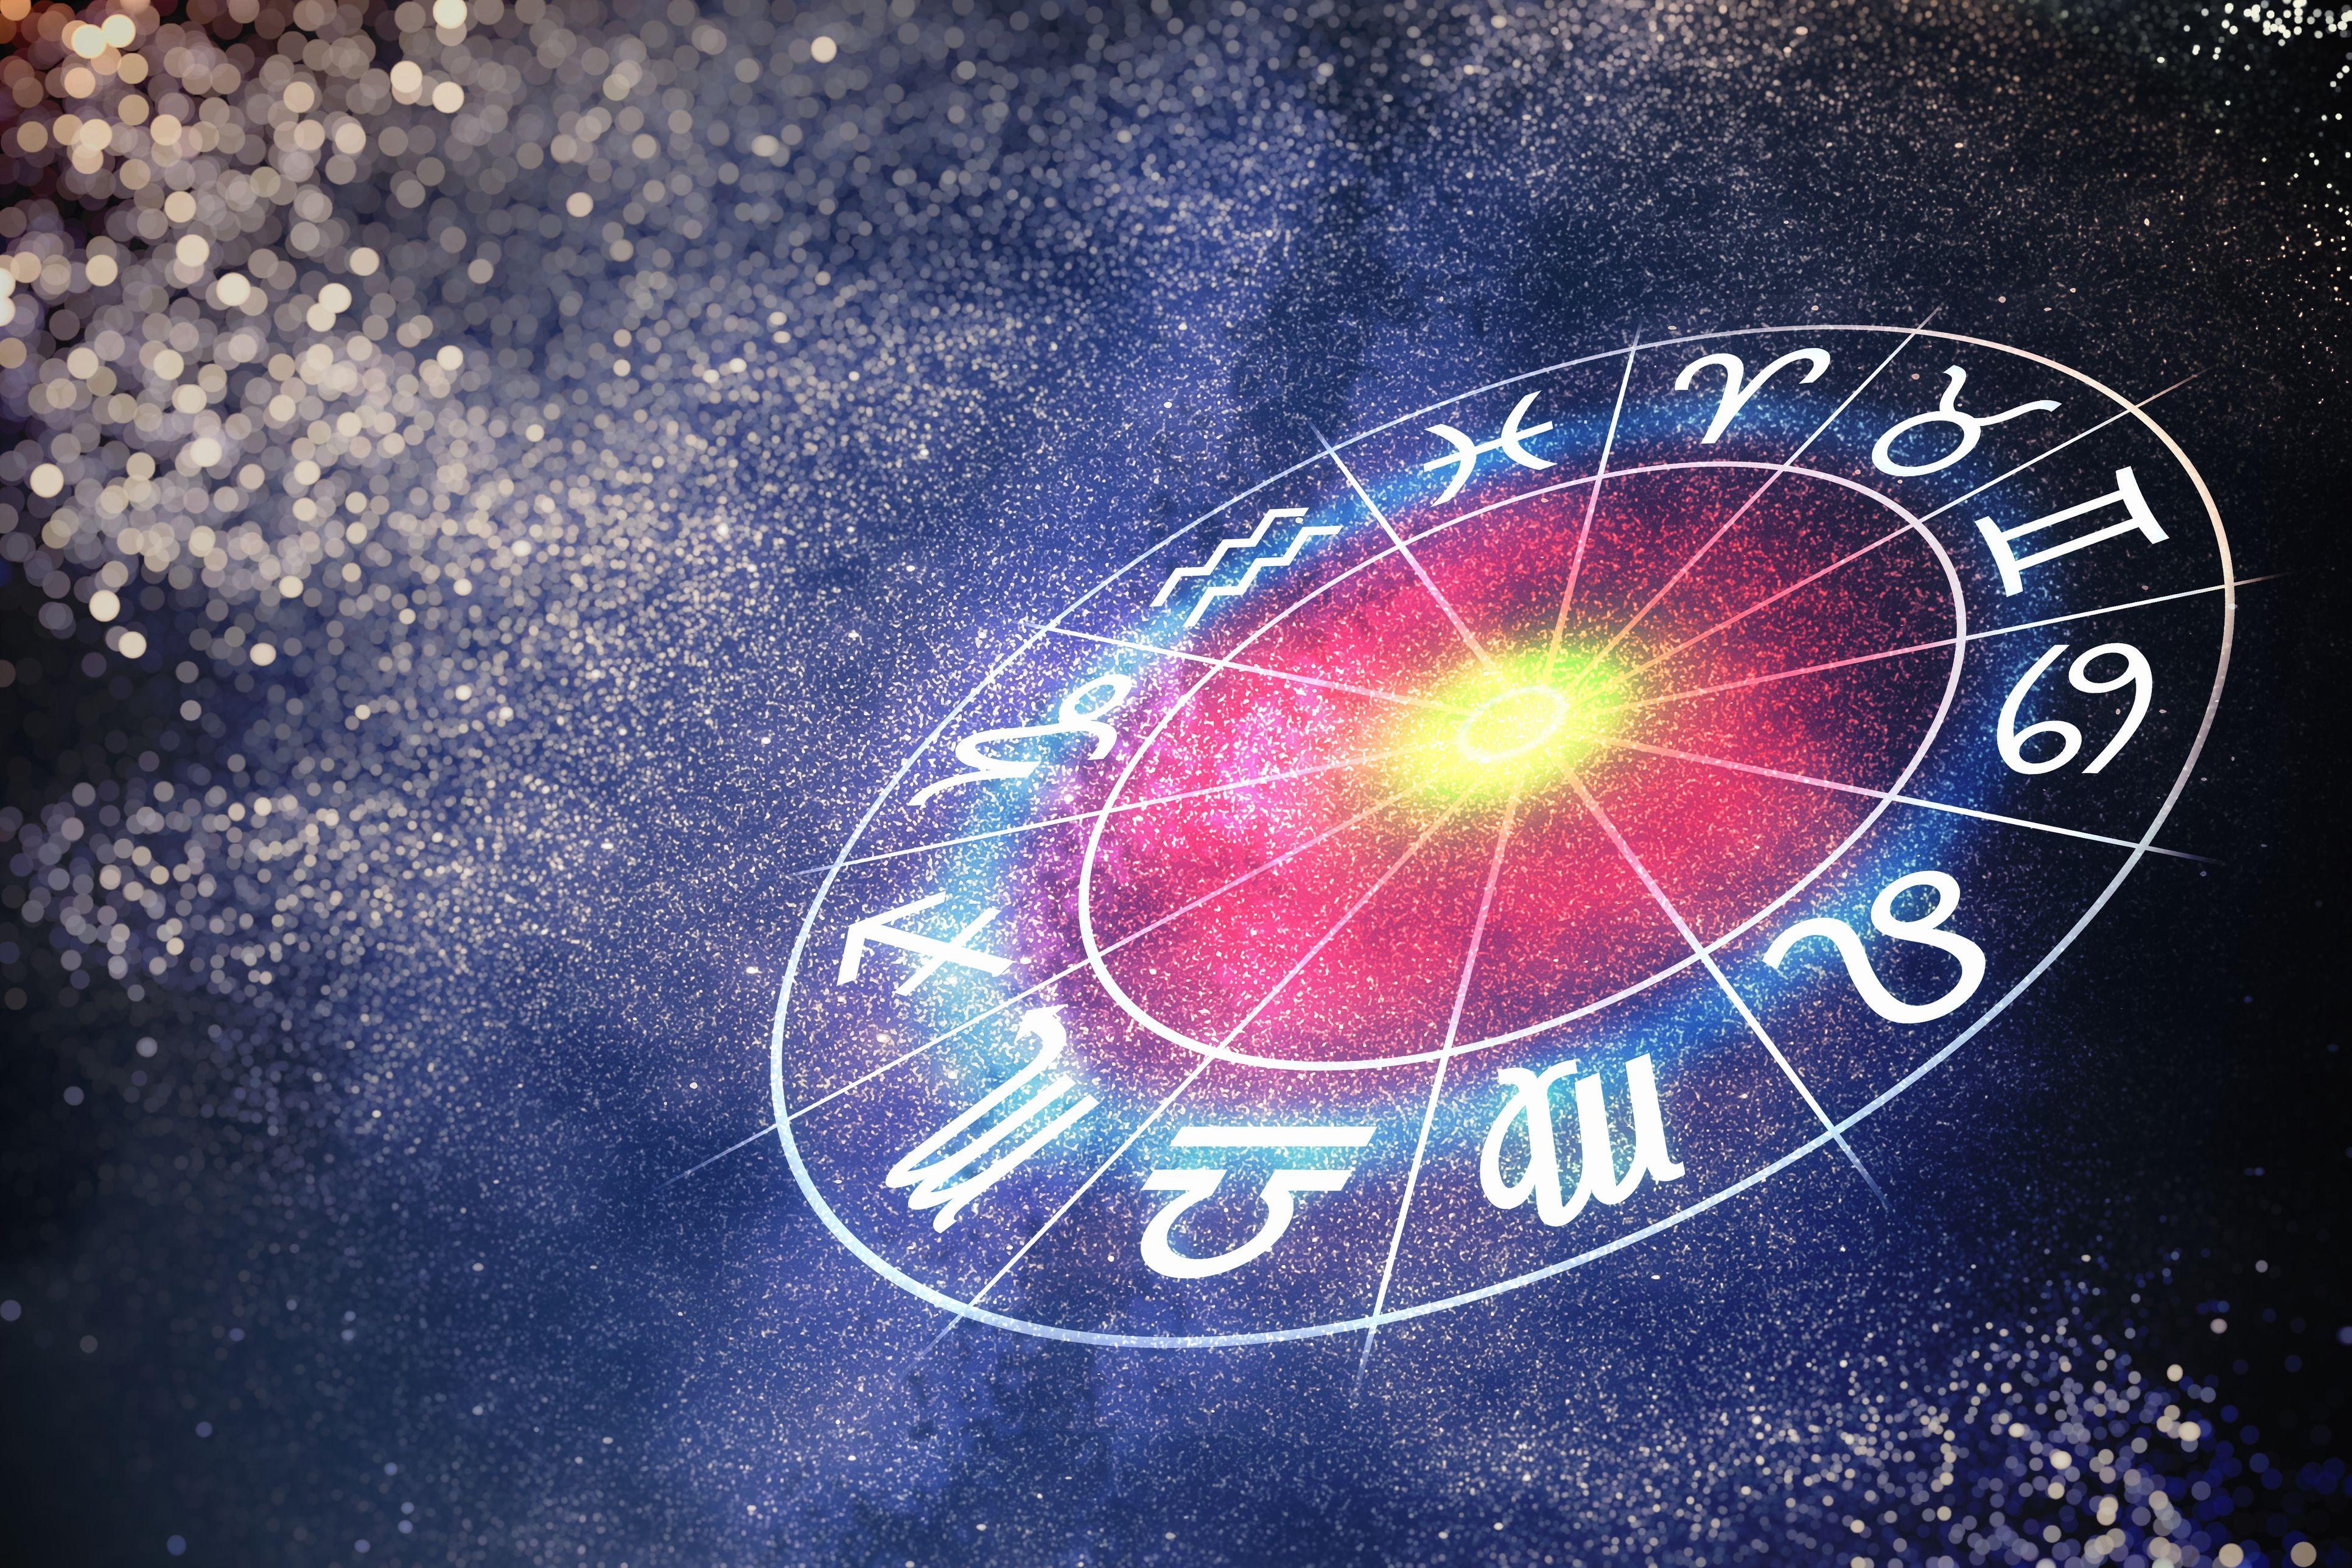 october 20 equinox astrology